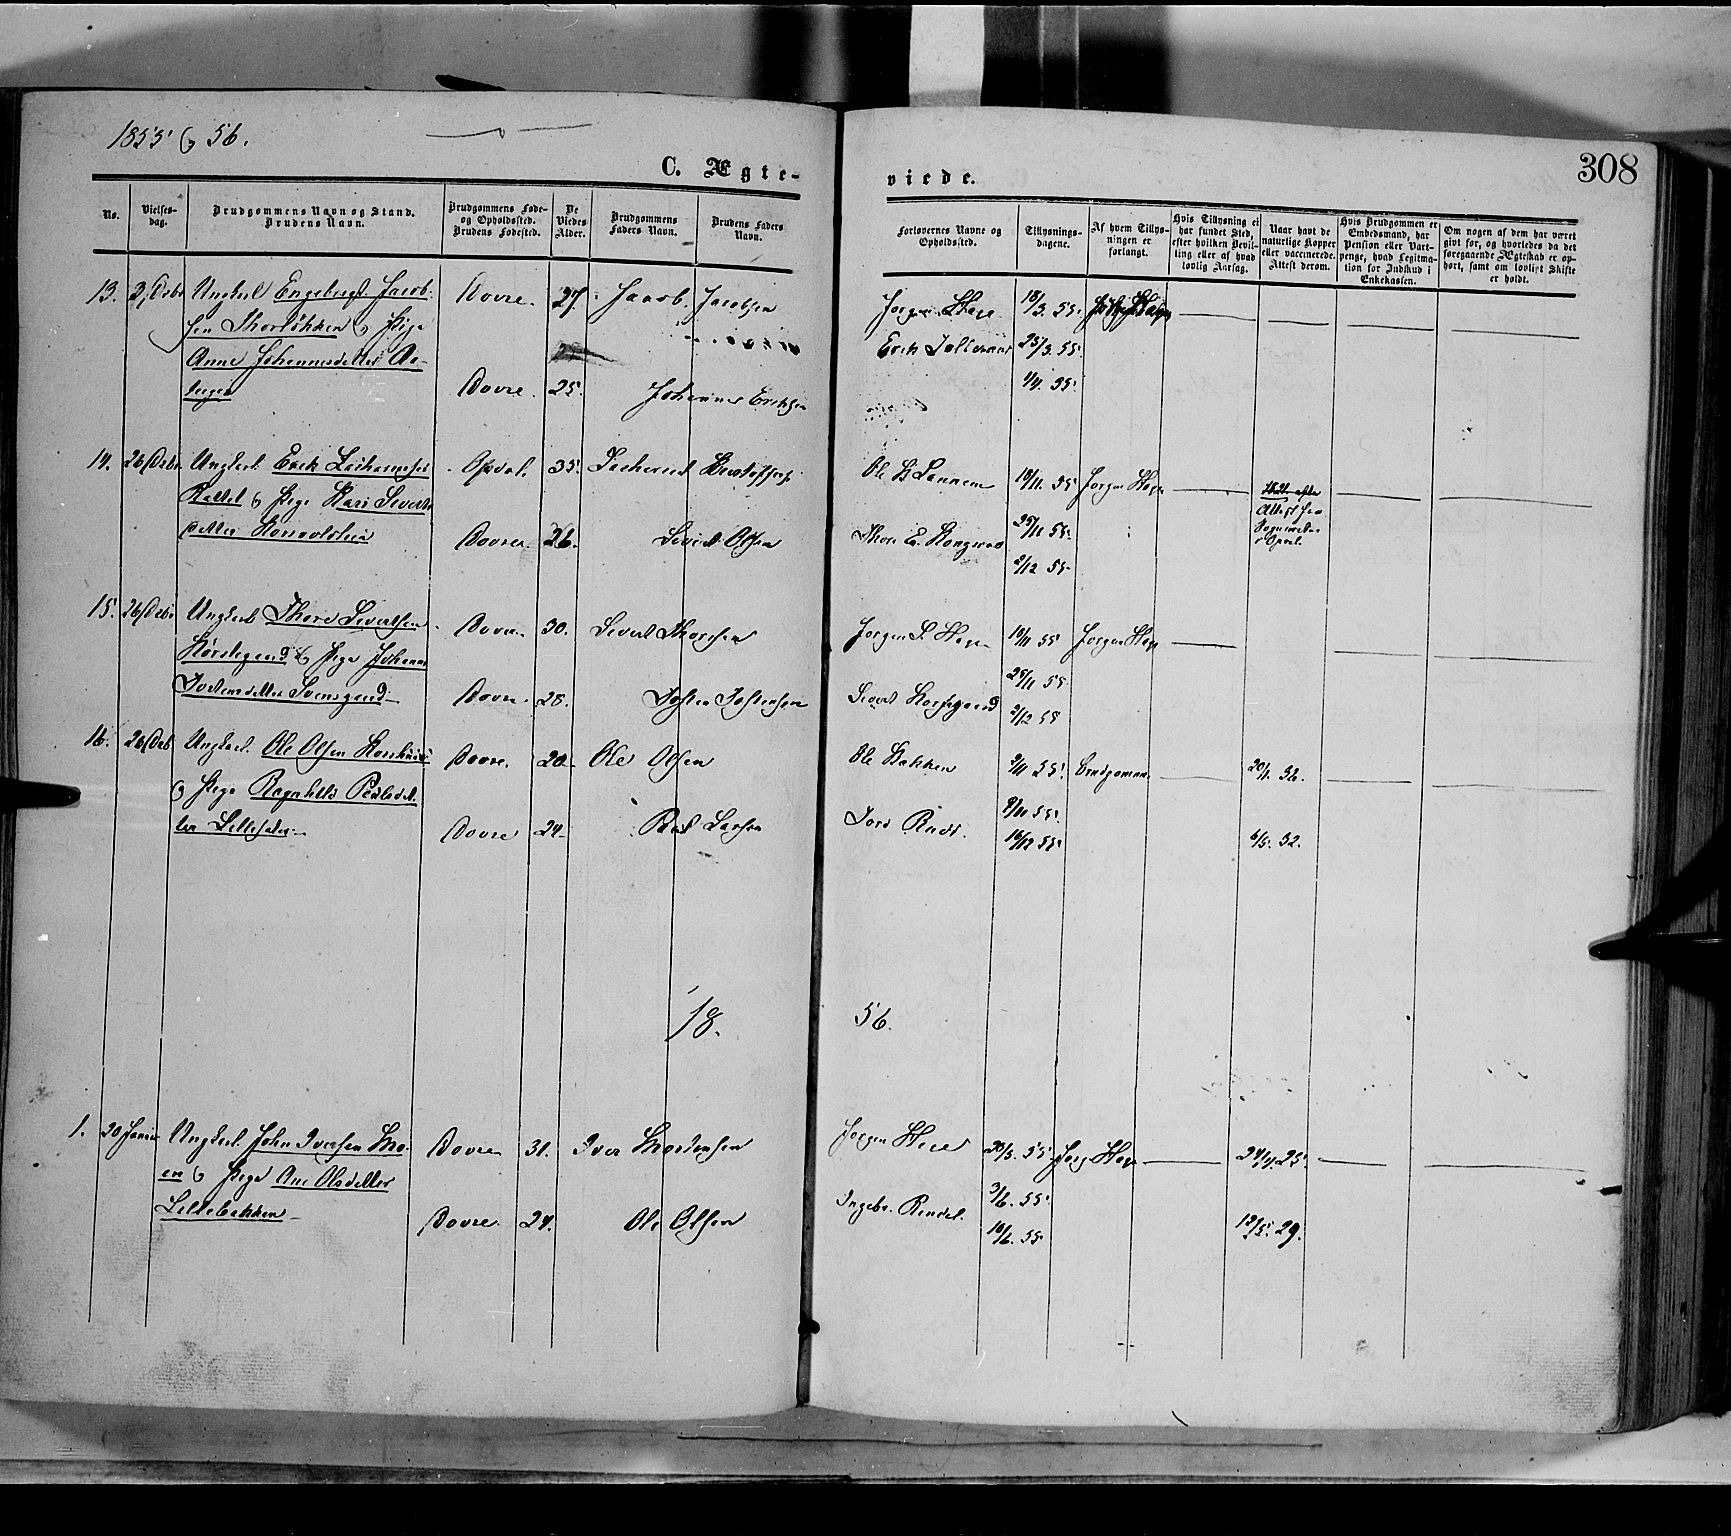 SAH, Dovre prestekontor, Ministerialbok nr. 1, 1854-1878, s. 308